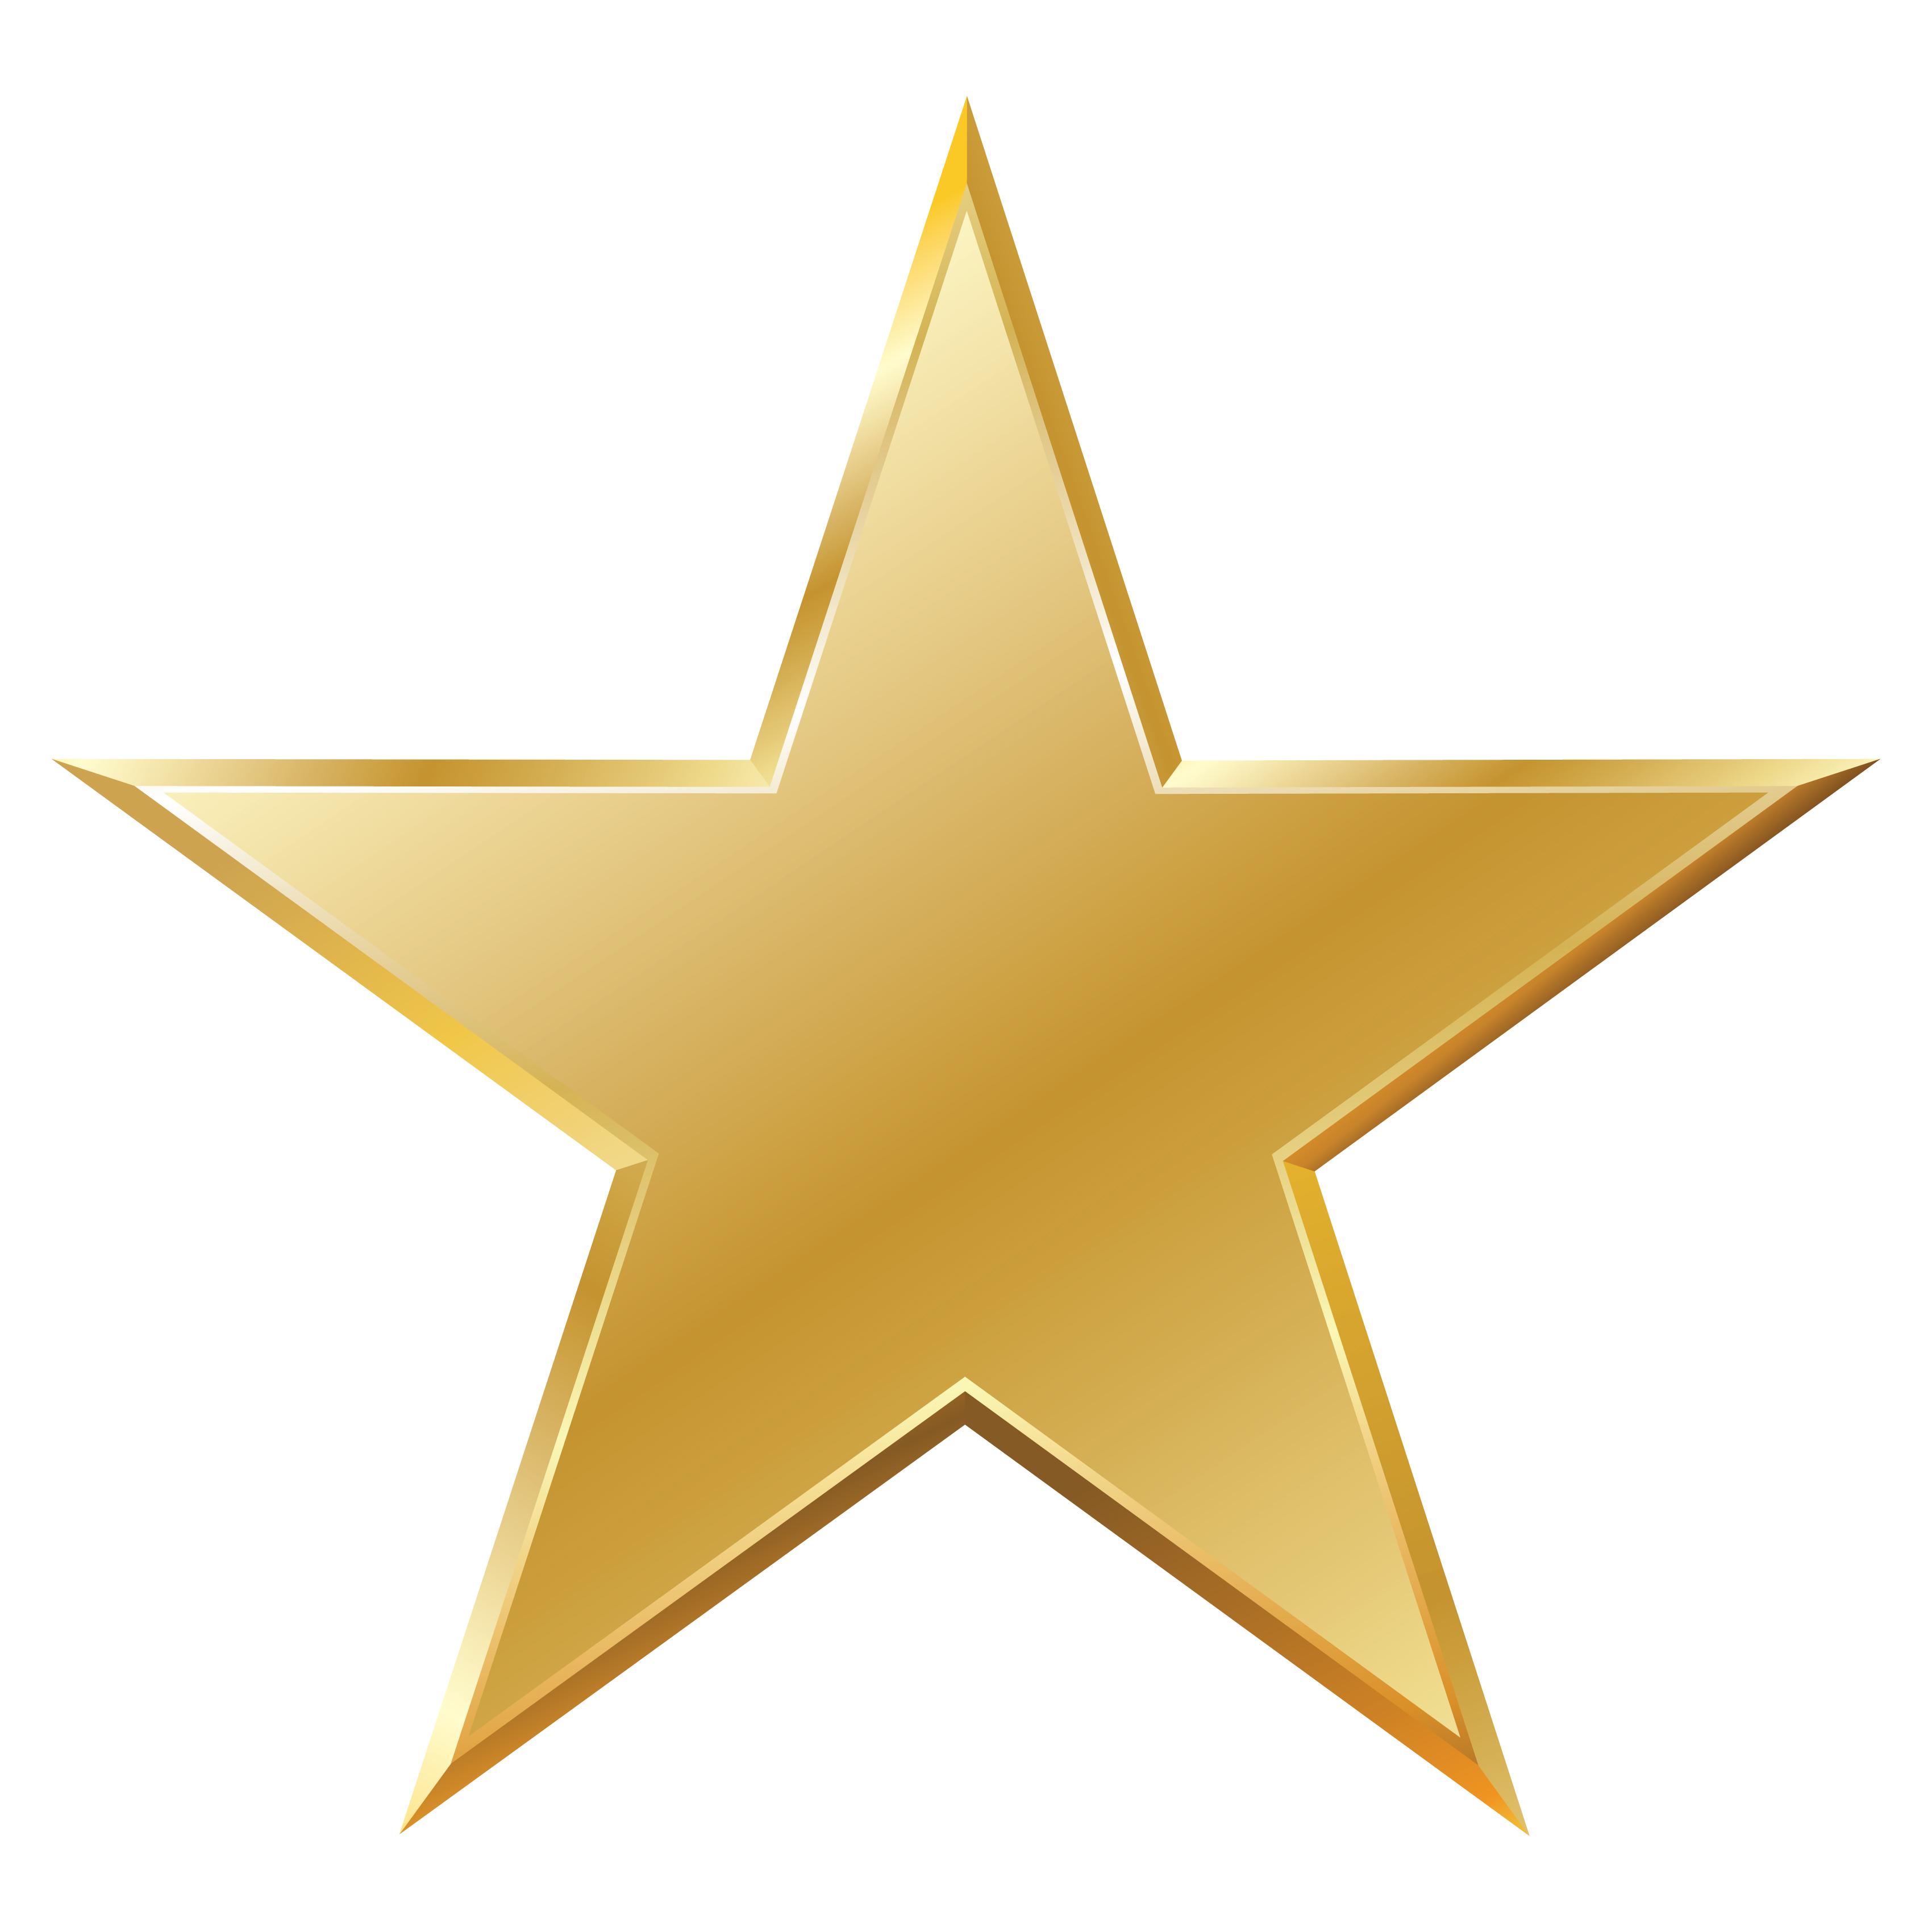 Gold Star Clip Art - Gold Star Clipart